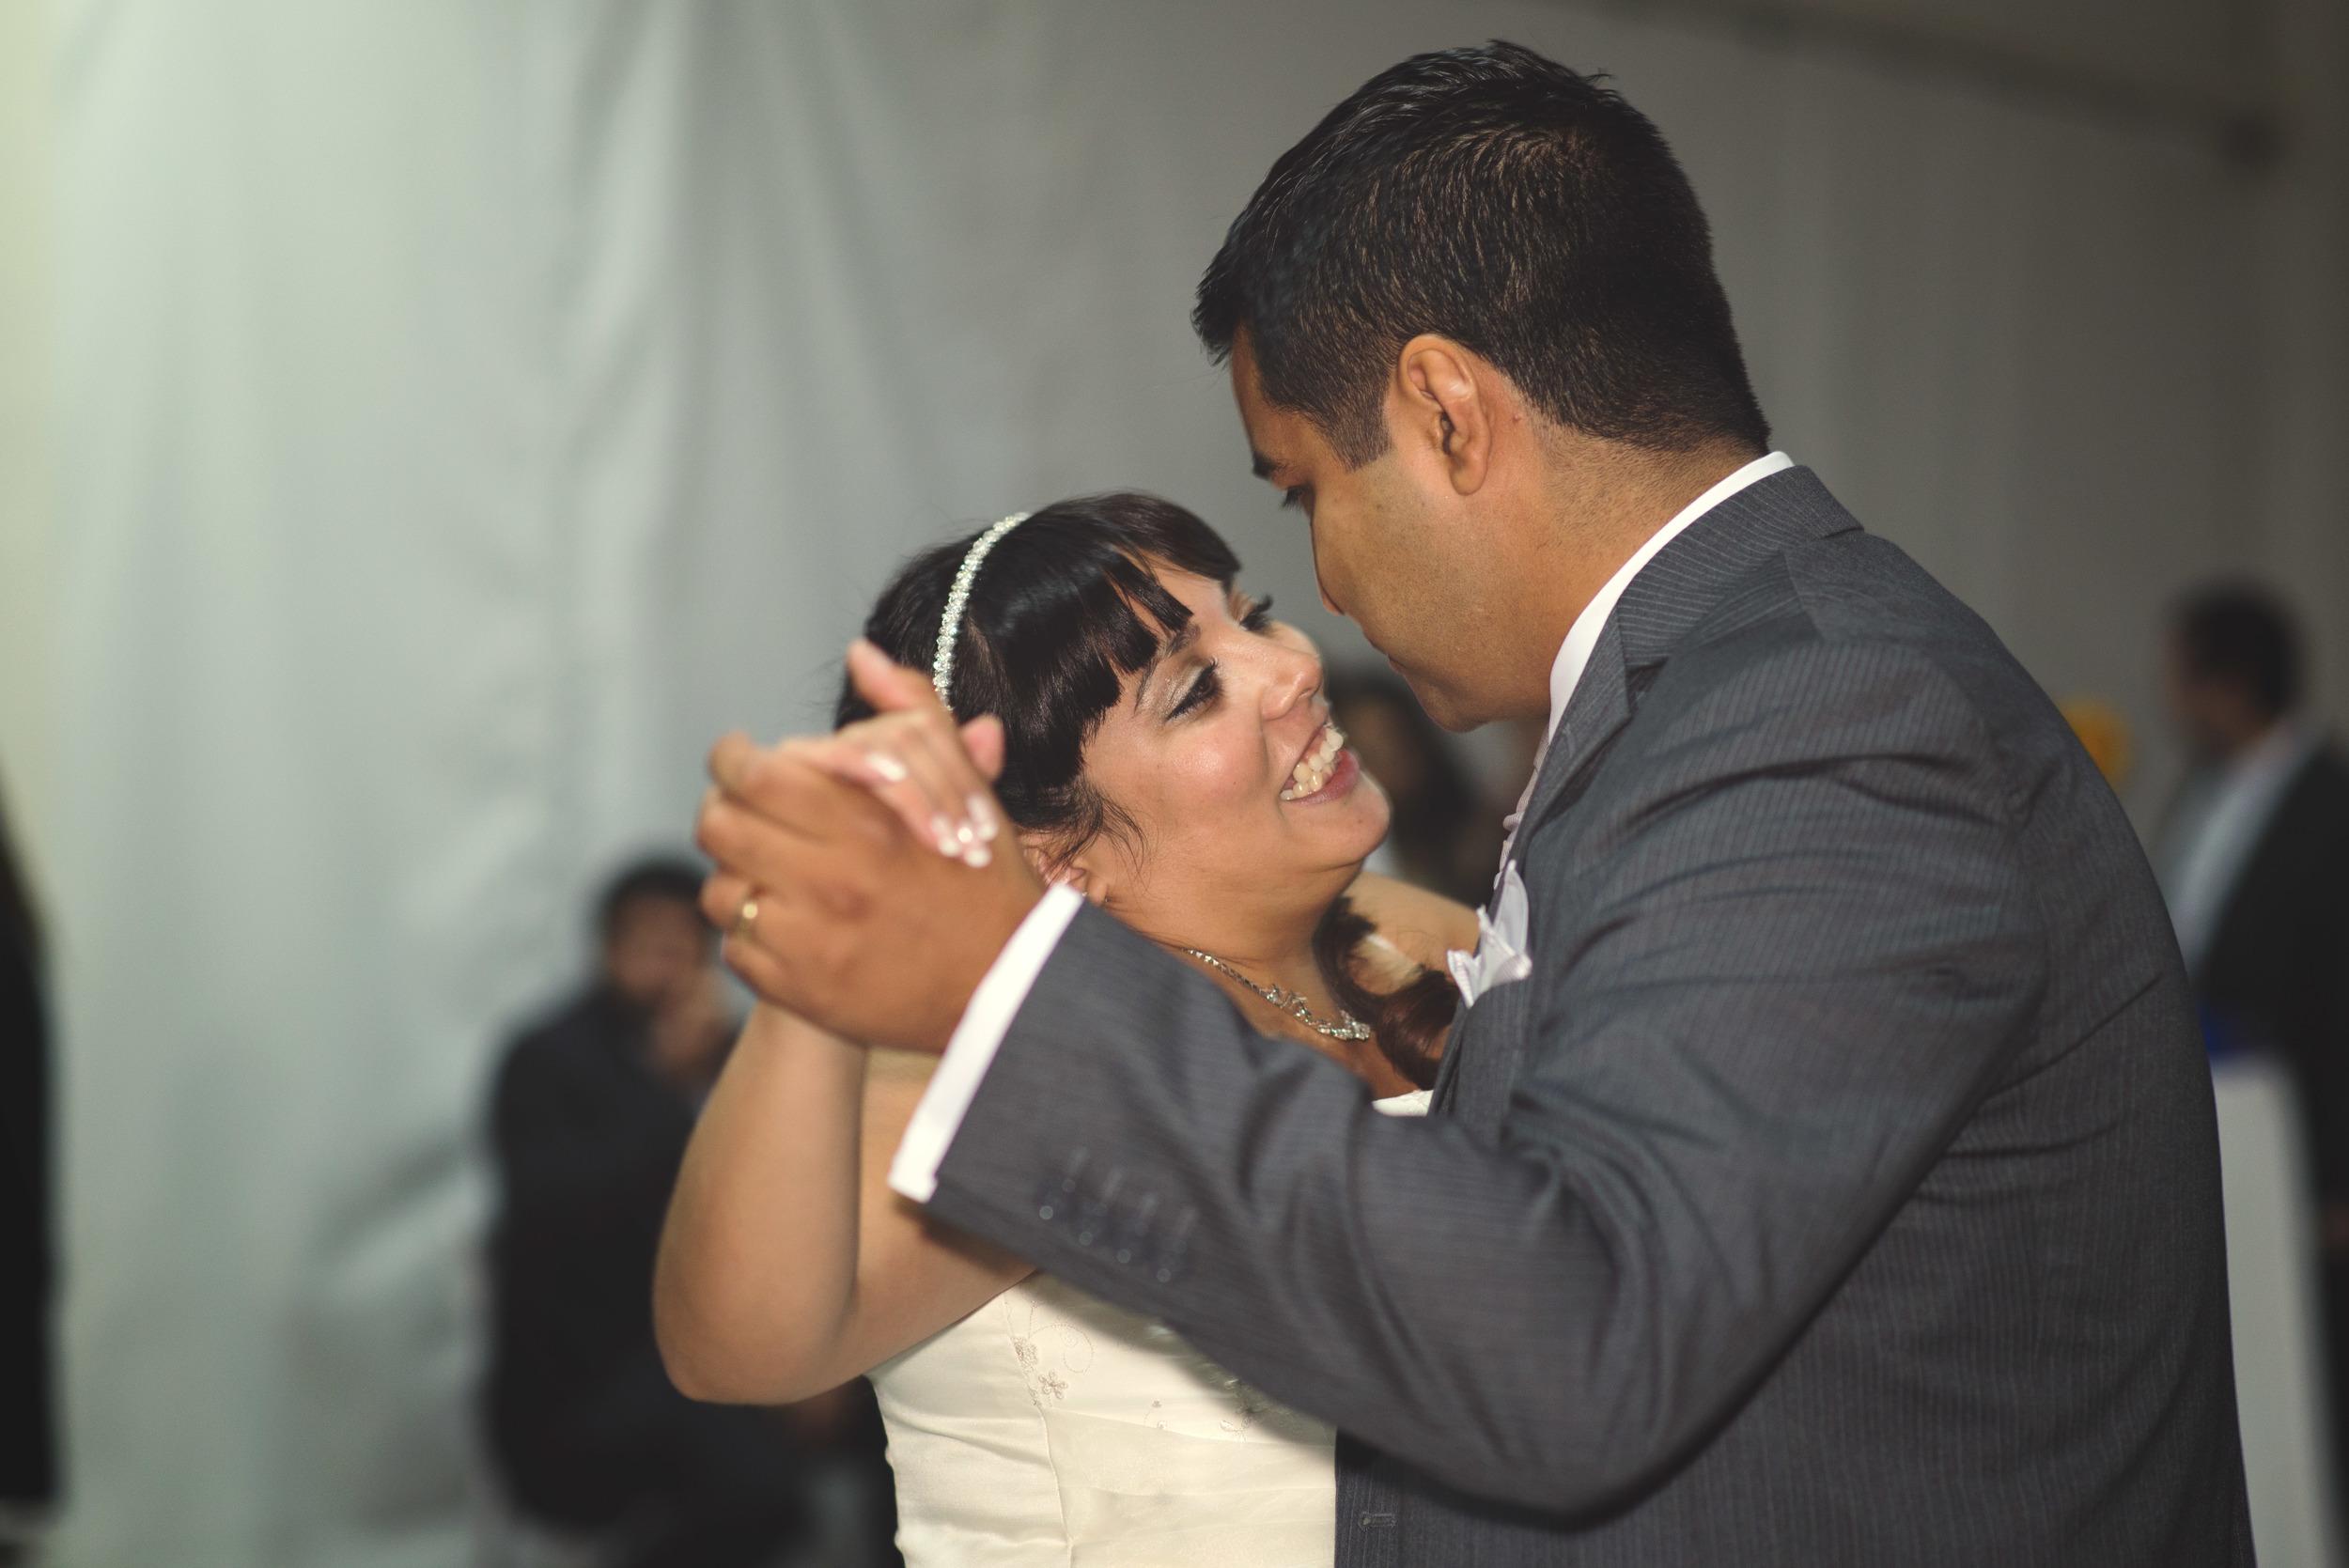 Marco + Maca = Chilean wedding :)